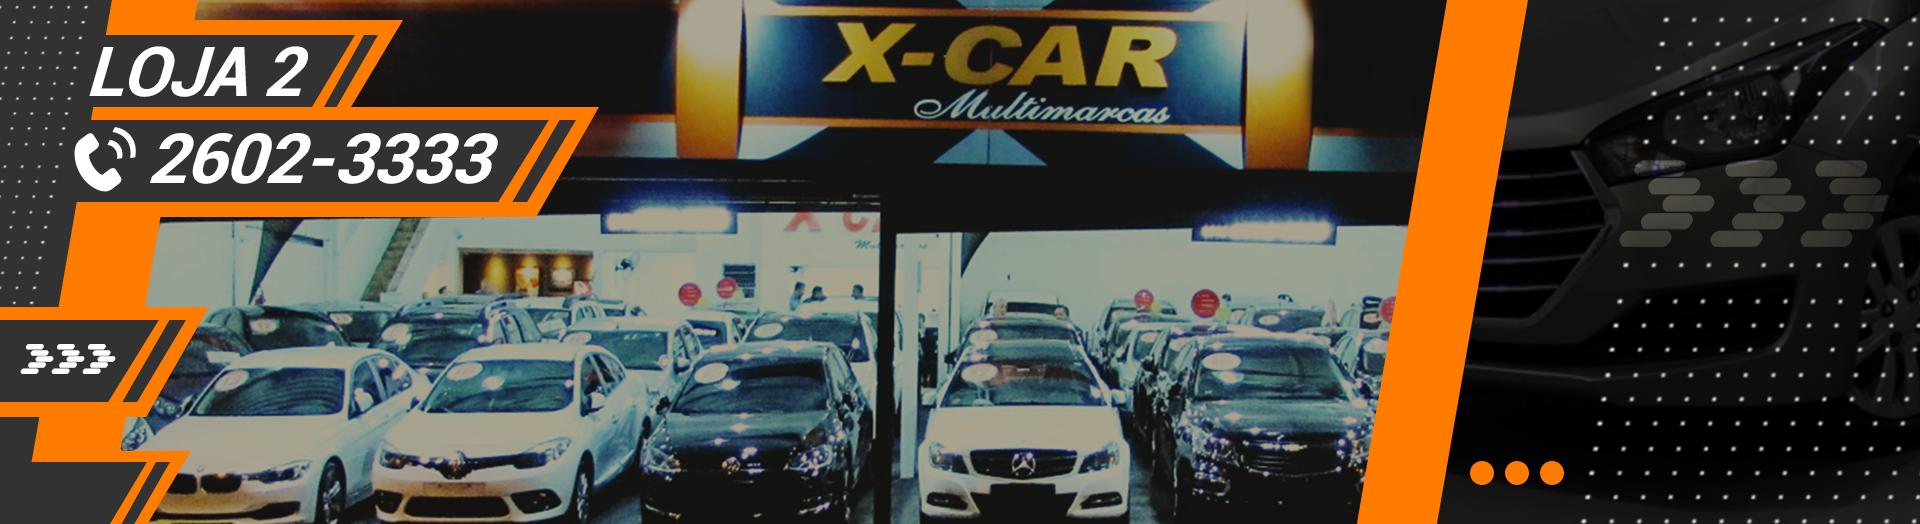 65da69837 Home - X Car Multimarcas